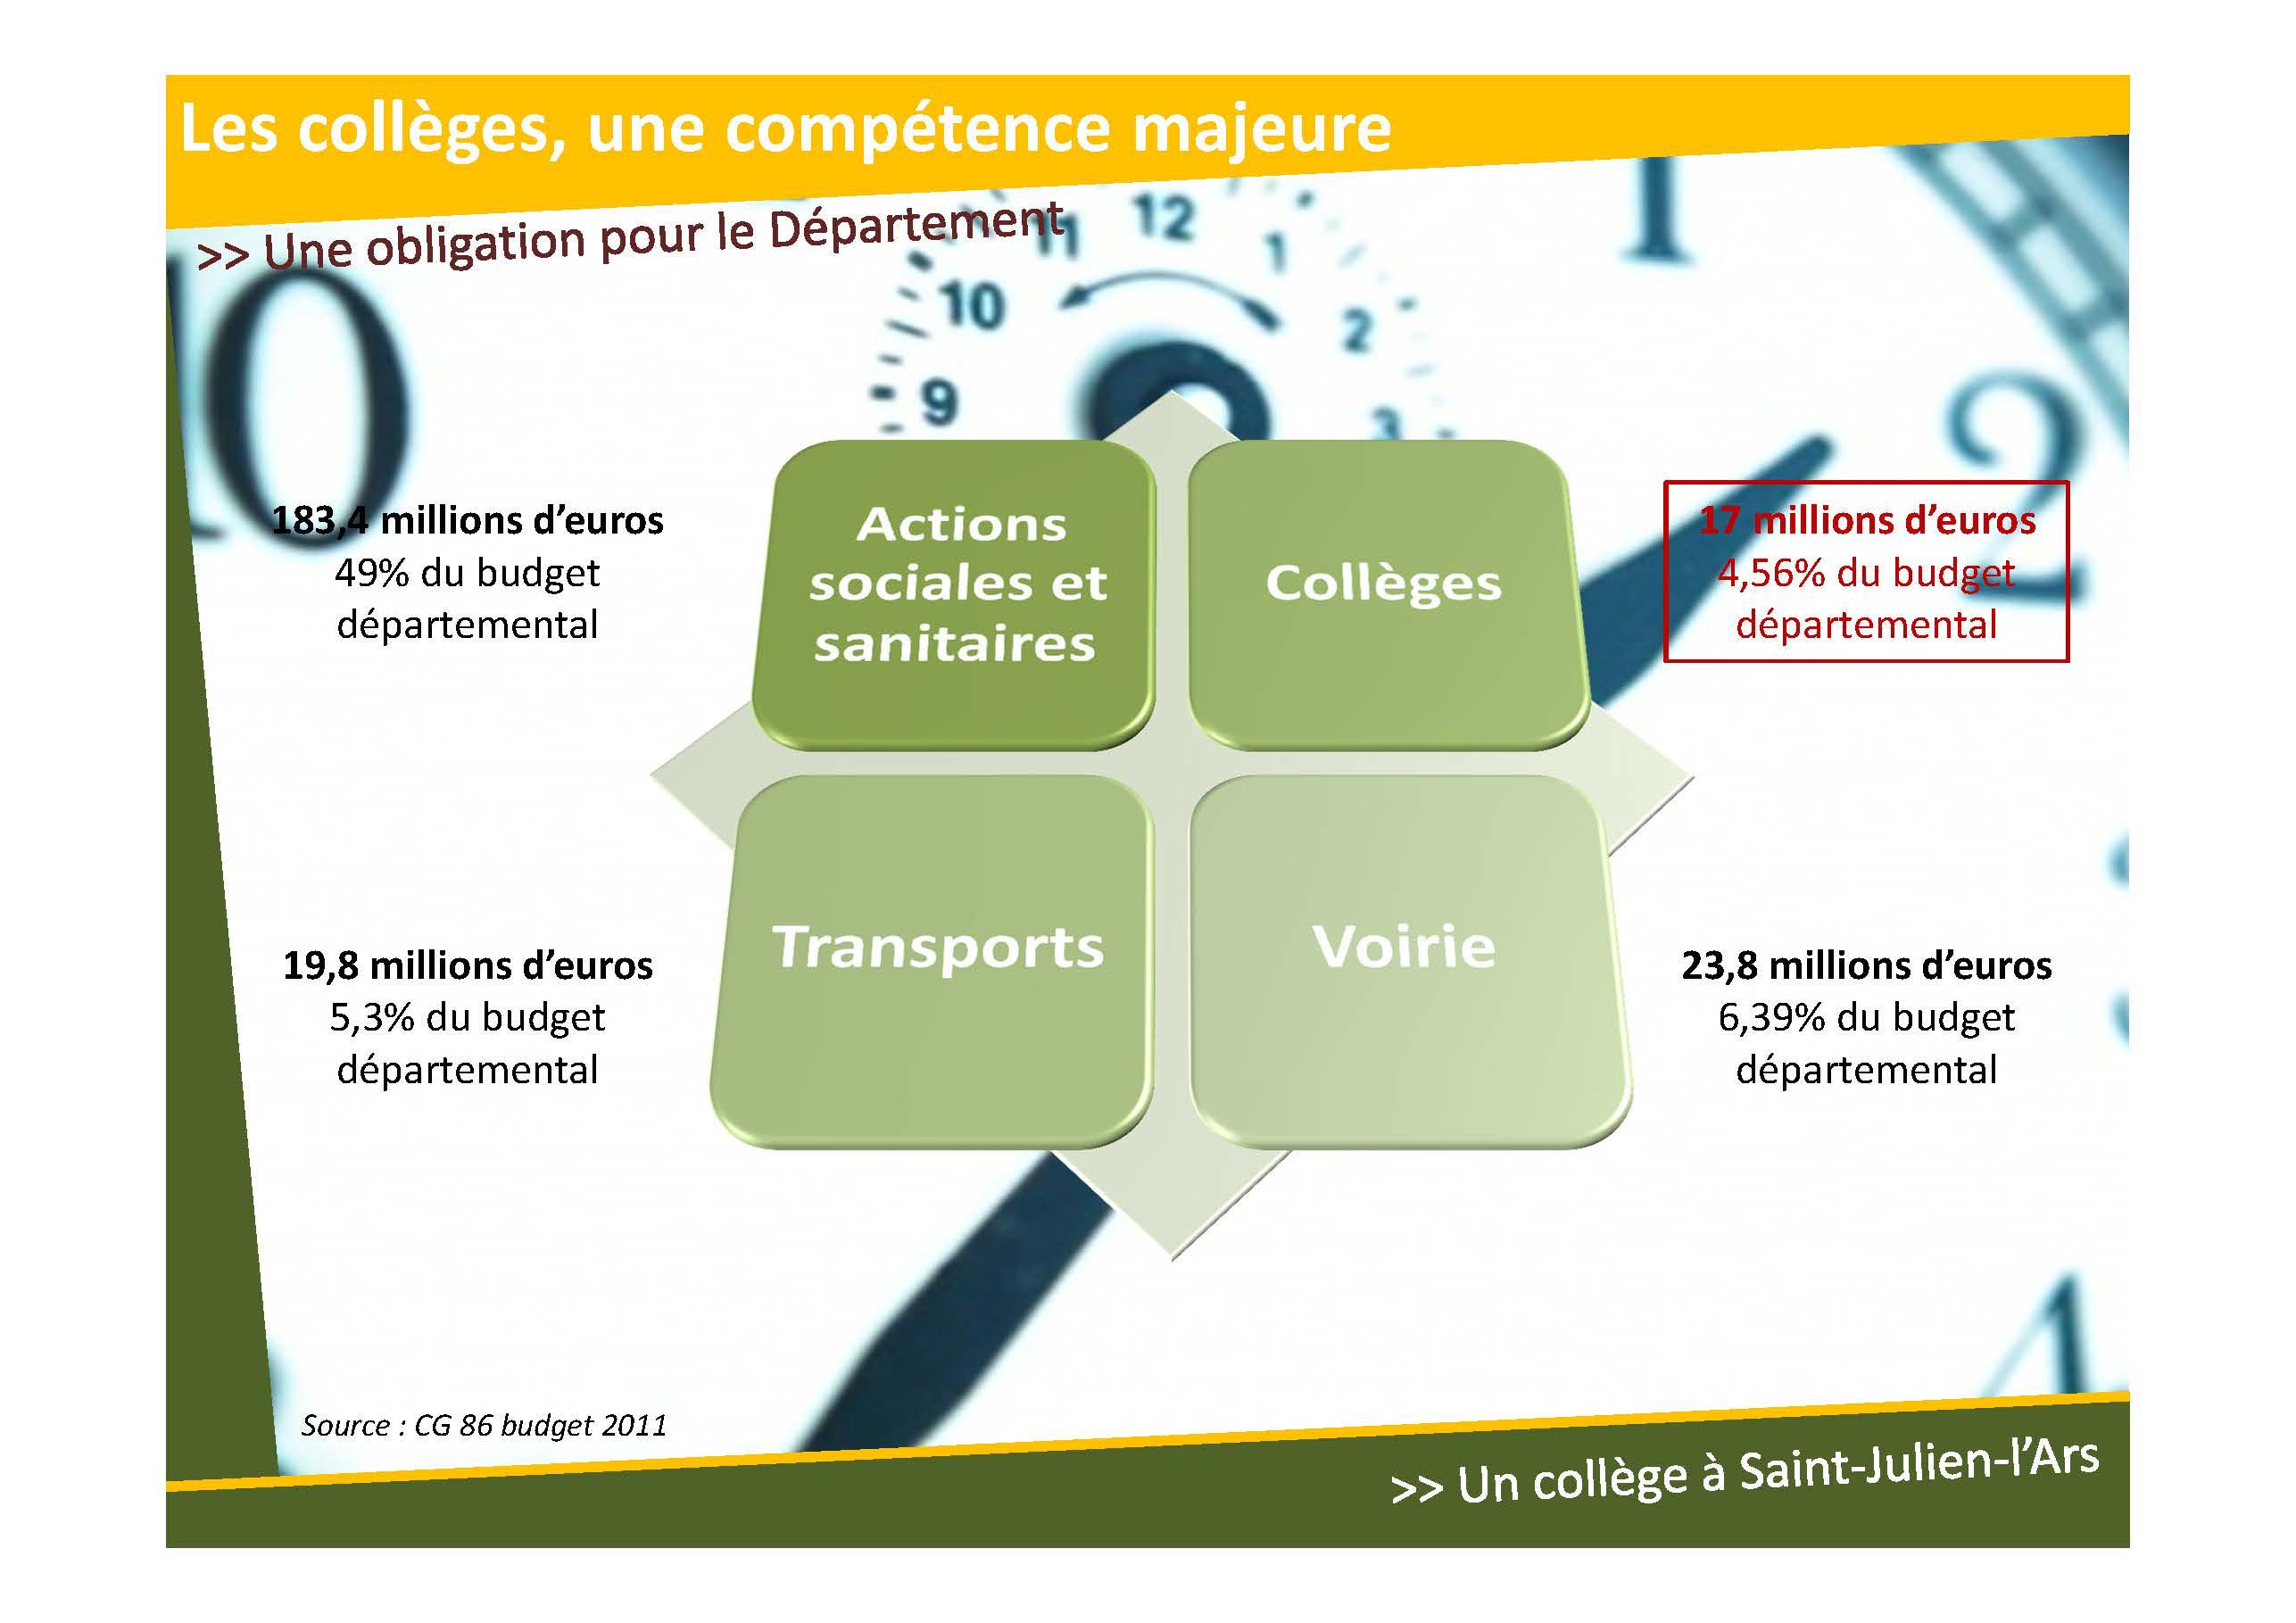 xaviermoinier-college_page_03